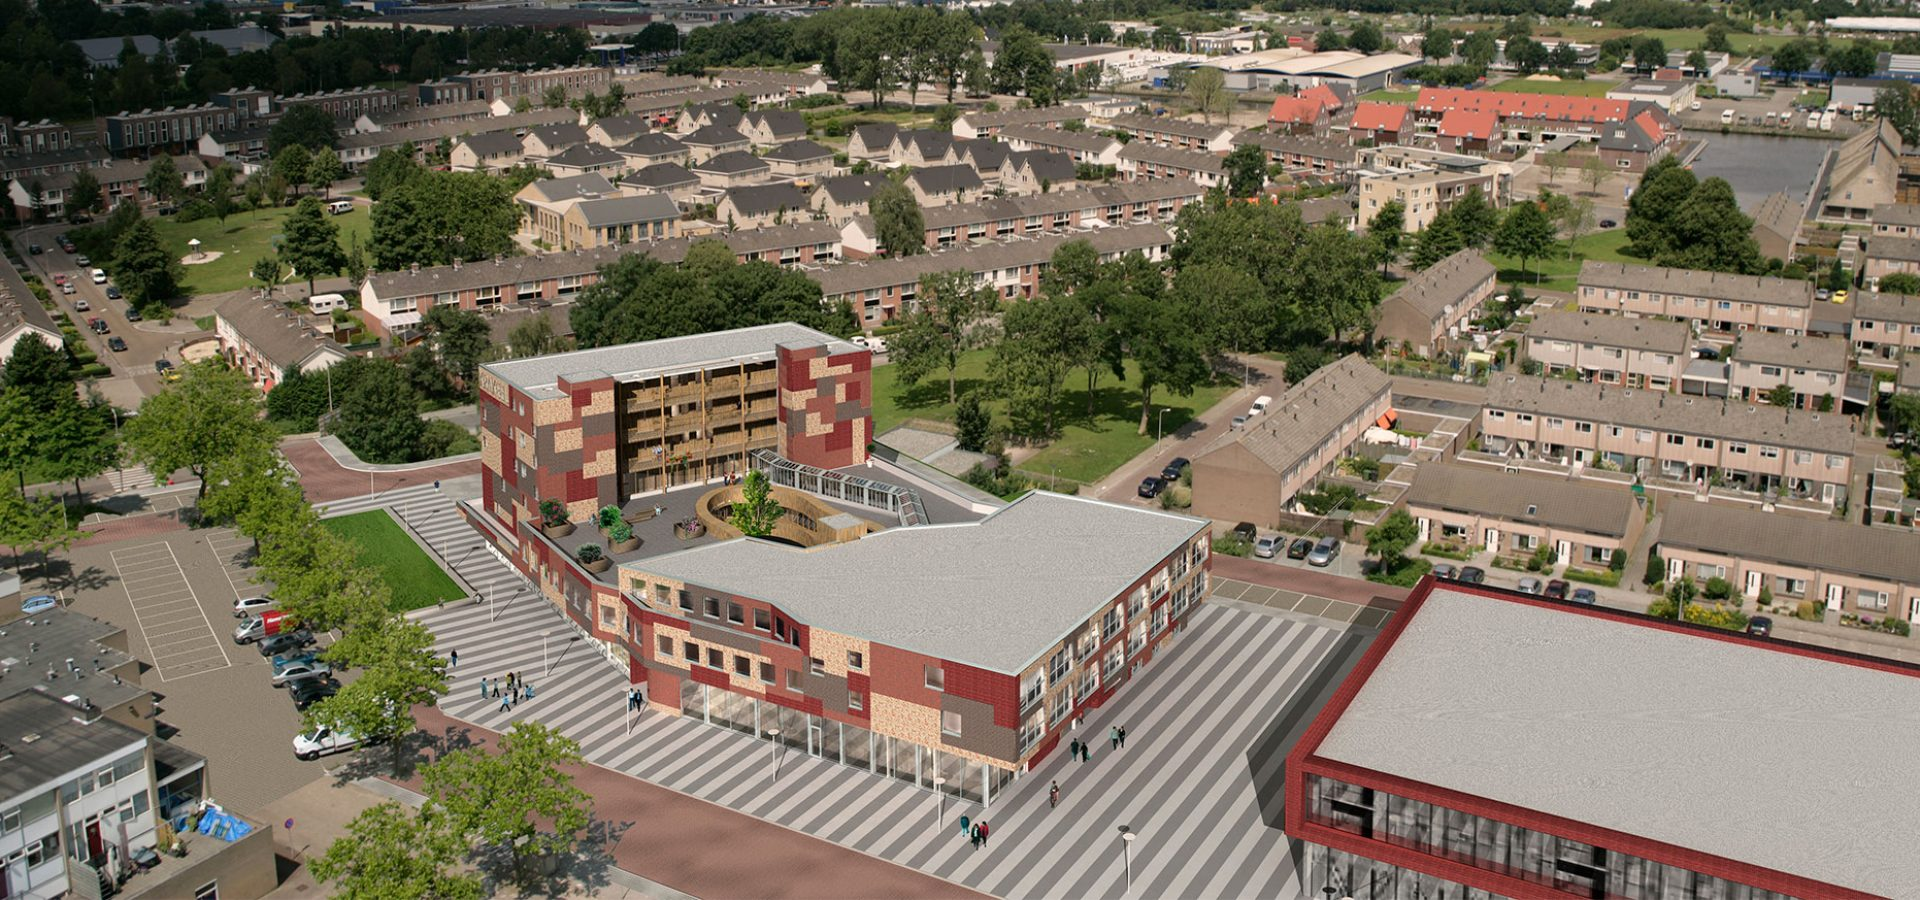 FARO architecten woon-servicegebouw Krakeel 02